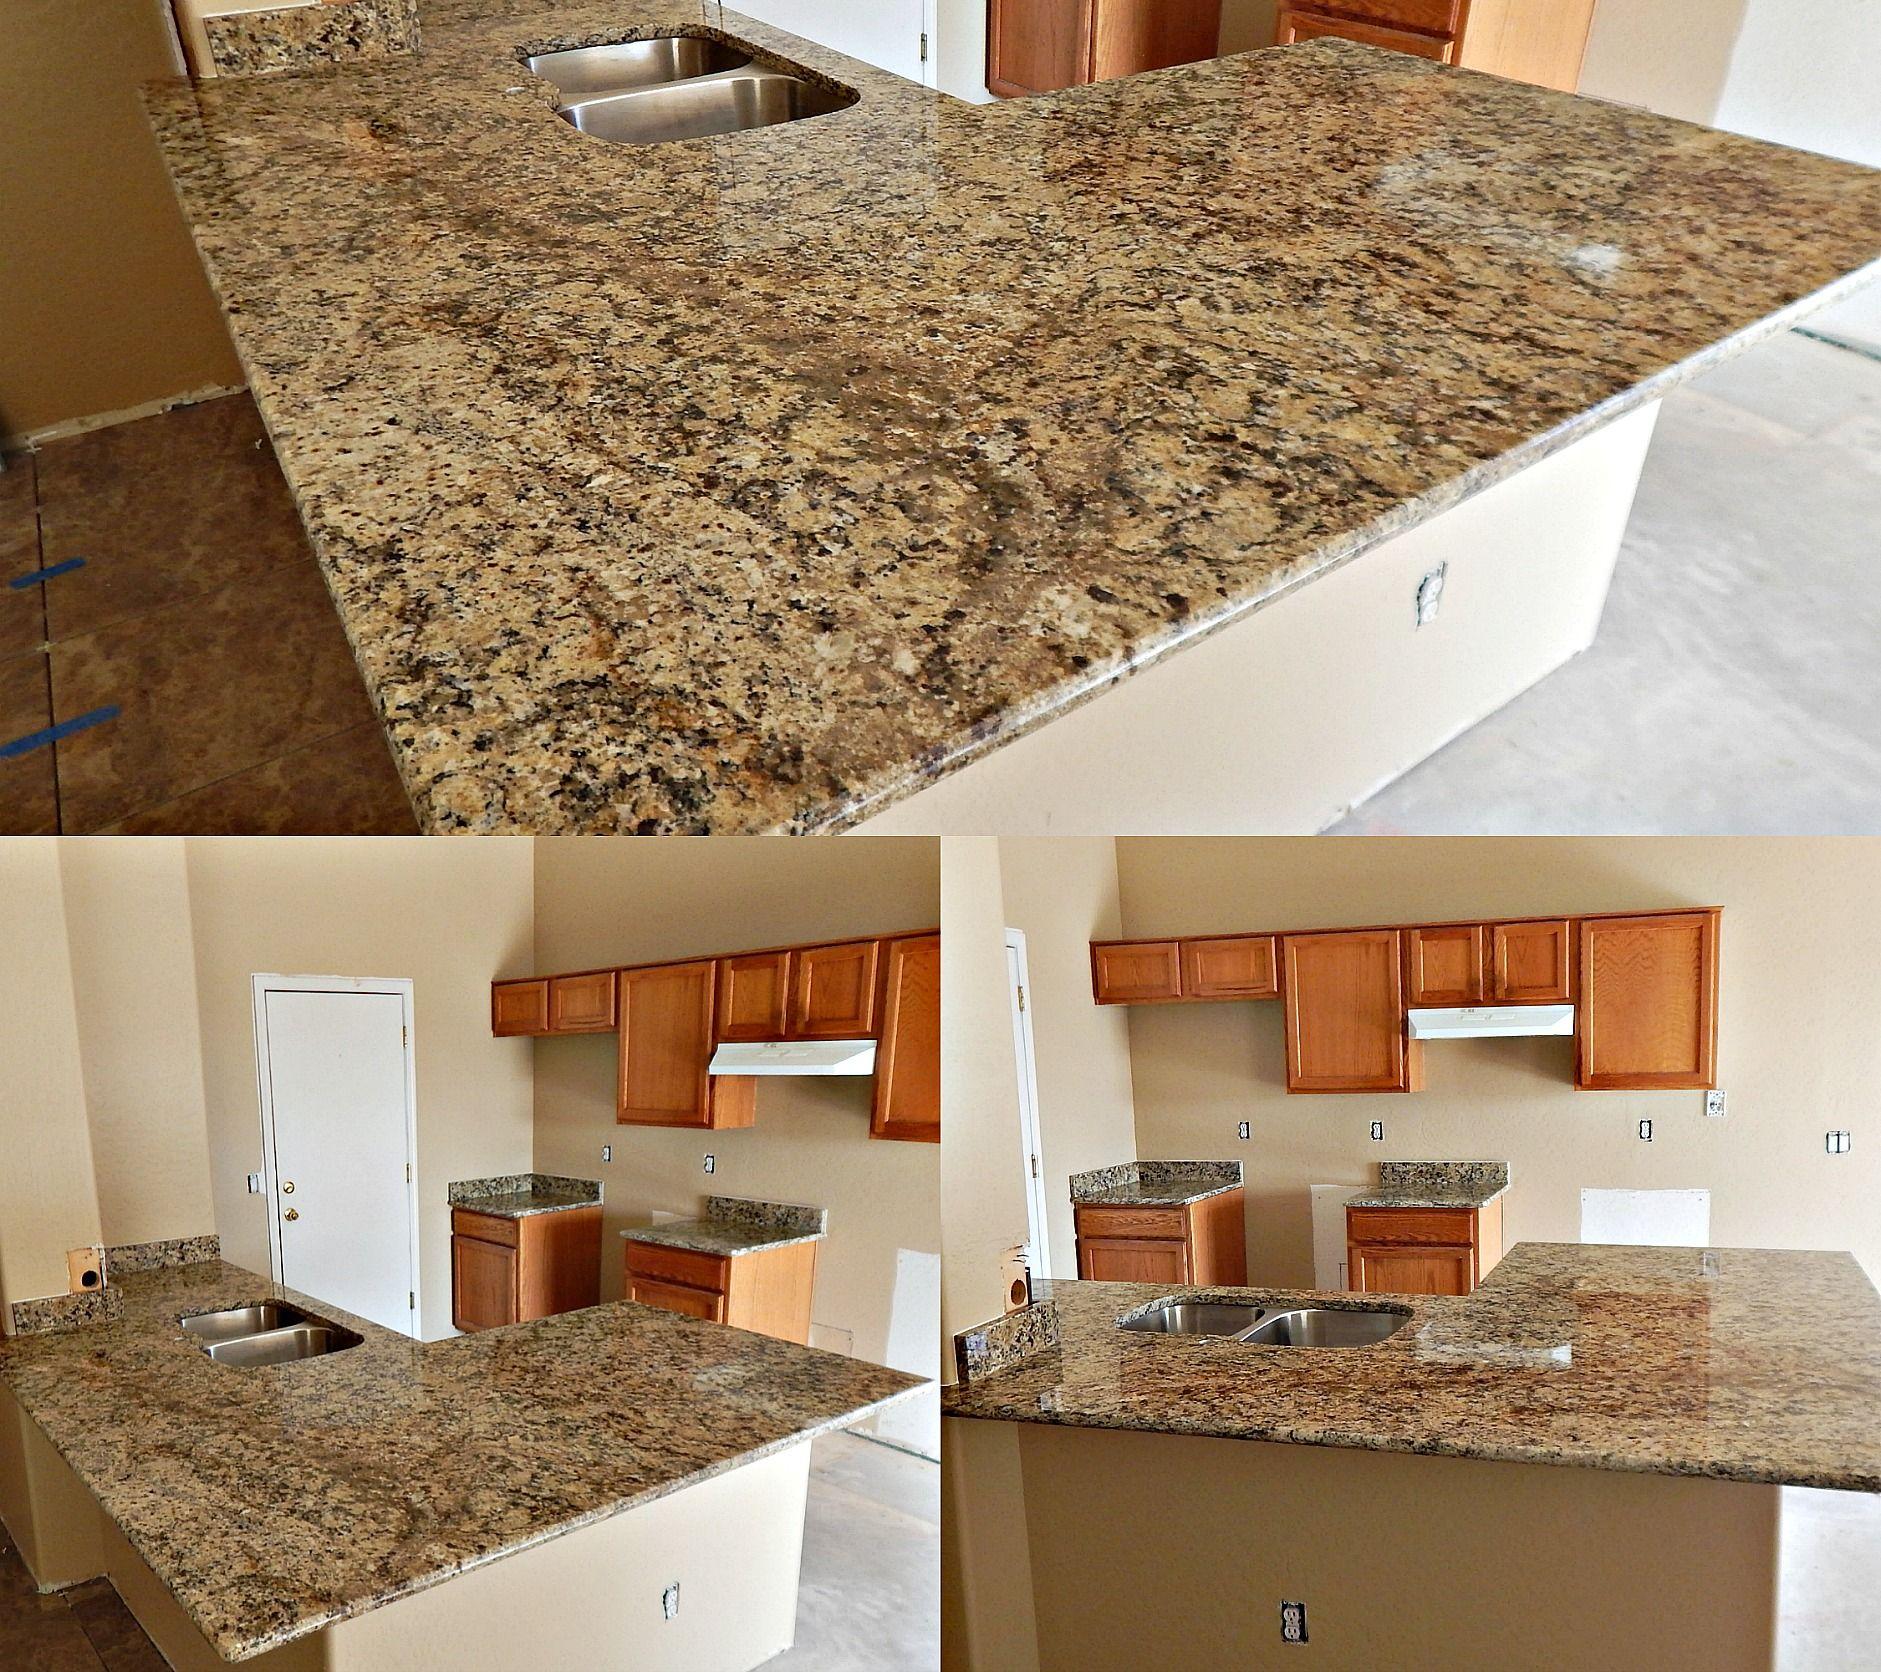 Granite Phoenix Granite Marble Countertop Kitchen Cabinet Remodeling Company In Arizona Marble Countertops Kitchen Countertops Countertop Remodel